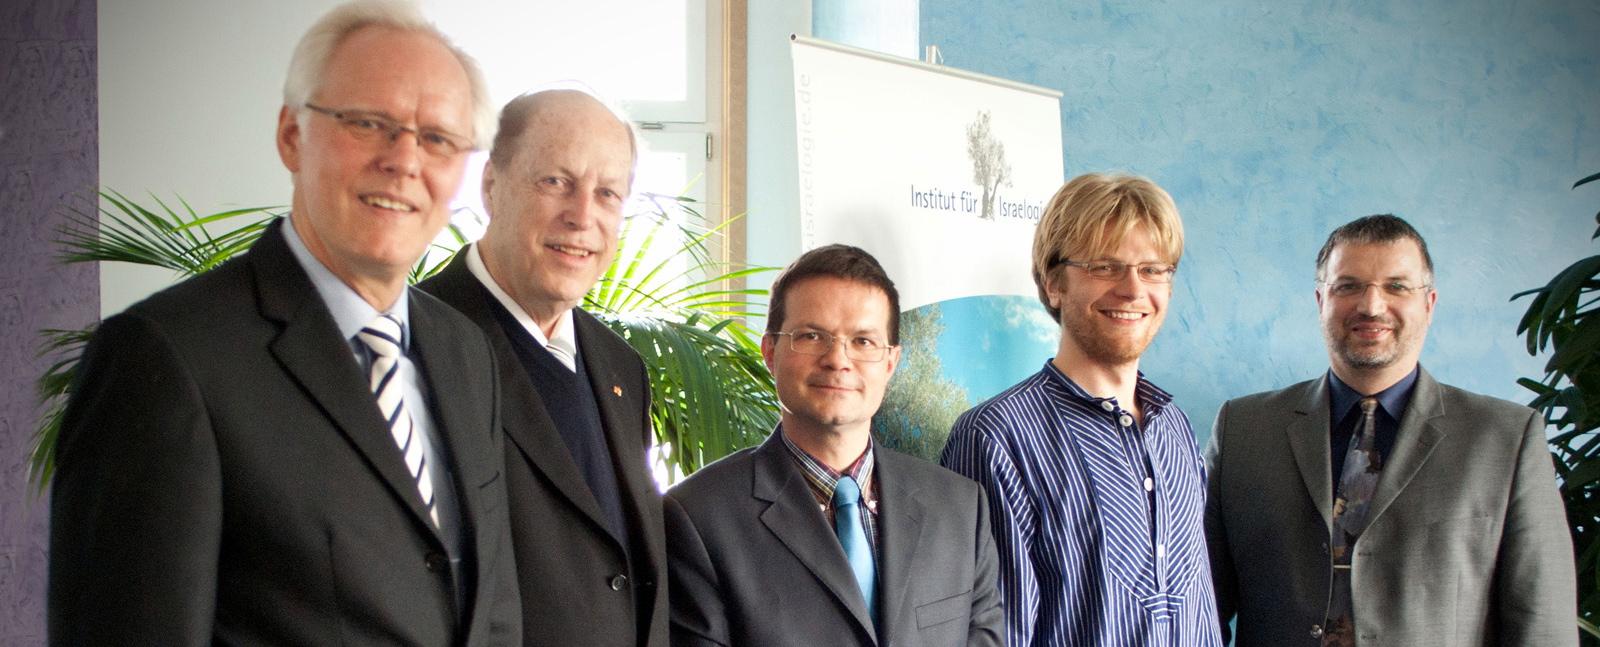 Prof. Dr. Helge Stadelmann, Dr. Fritz May, Dr. Christoph Stenschke, Moritz Deecke, Dr. Berthold Schwarz